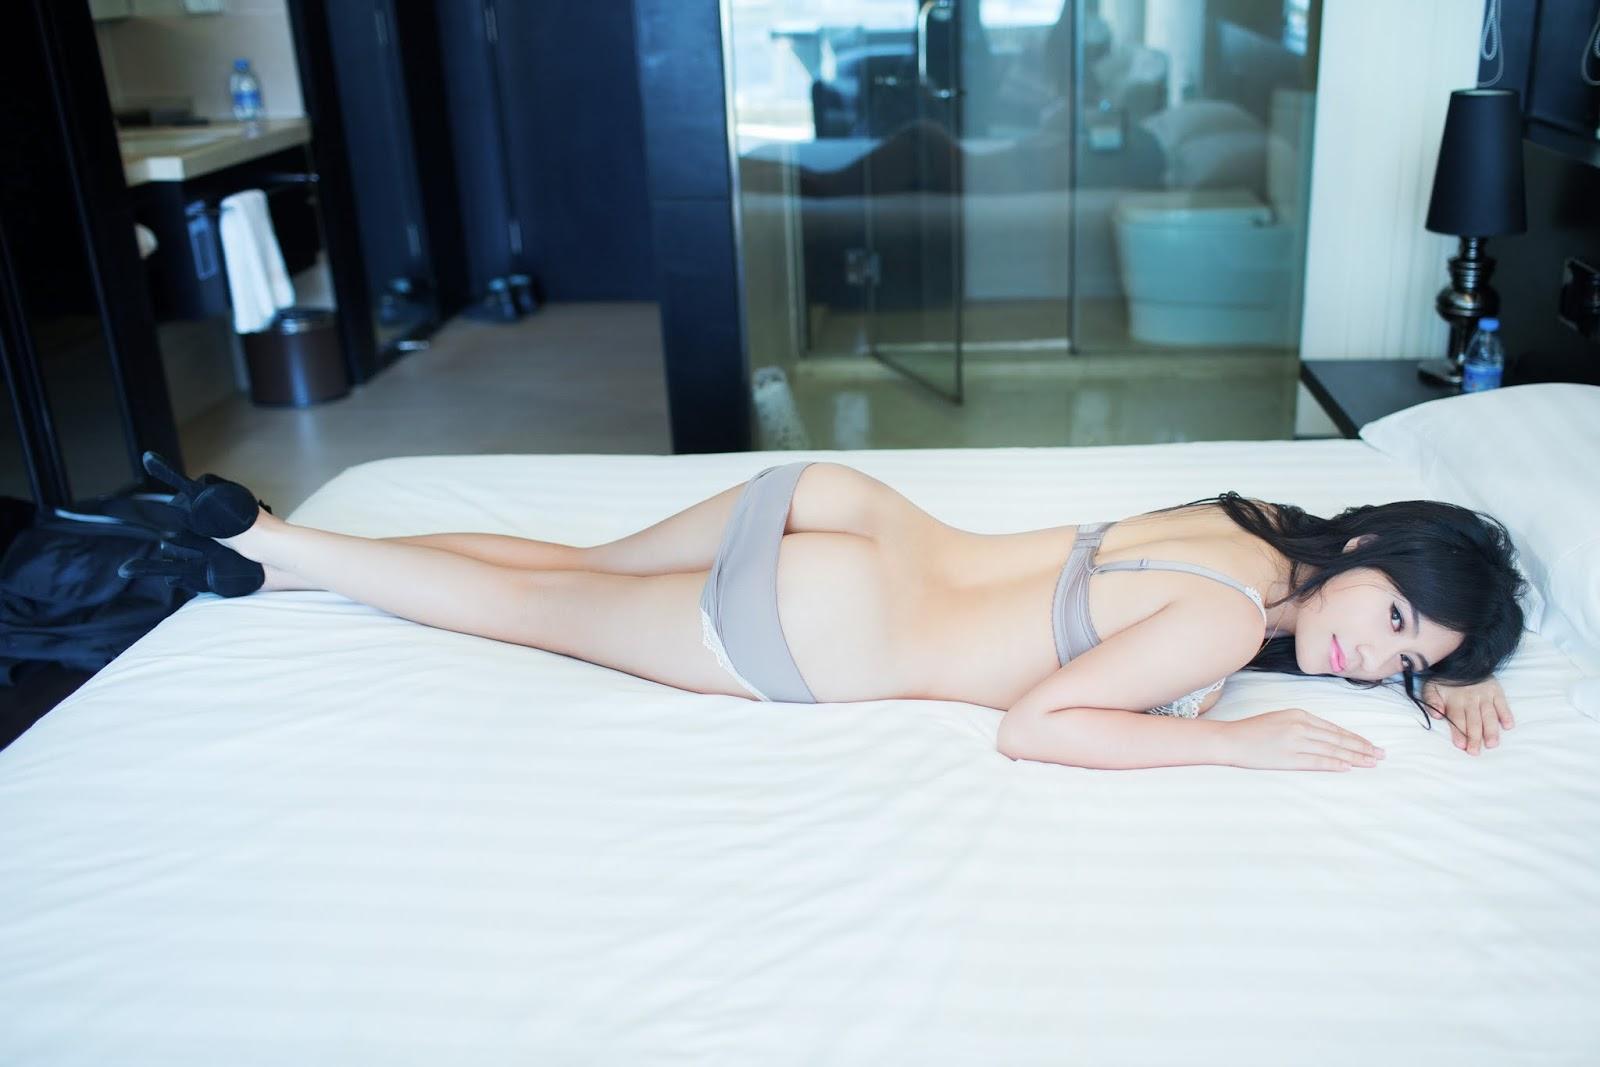 %25C2%25AC%252BO 05 - Hot Sexy Model TUIGIRL NO.46 Nude